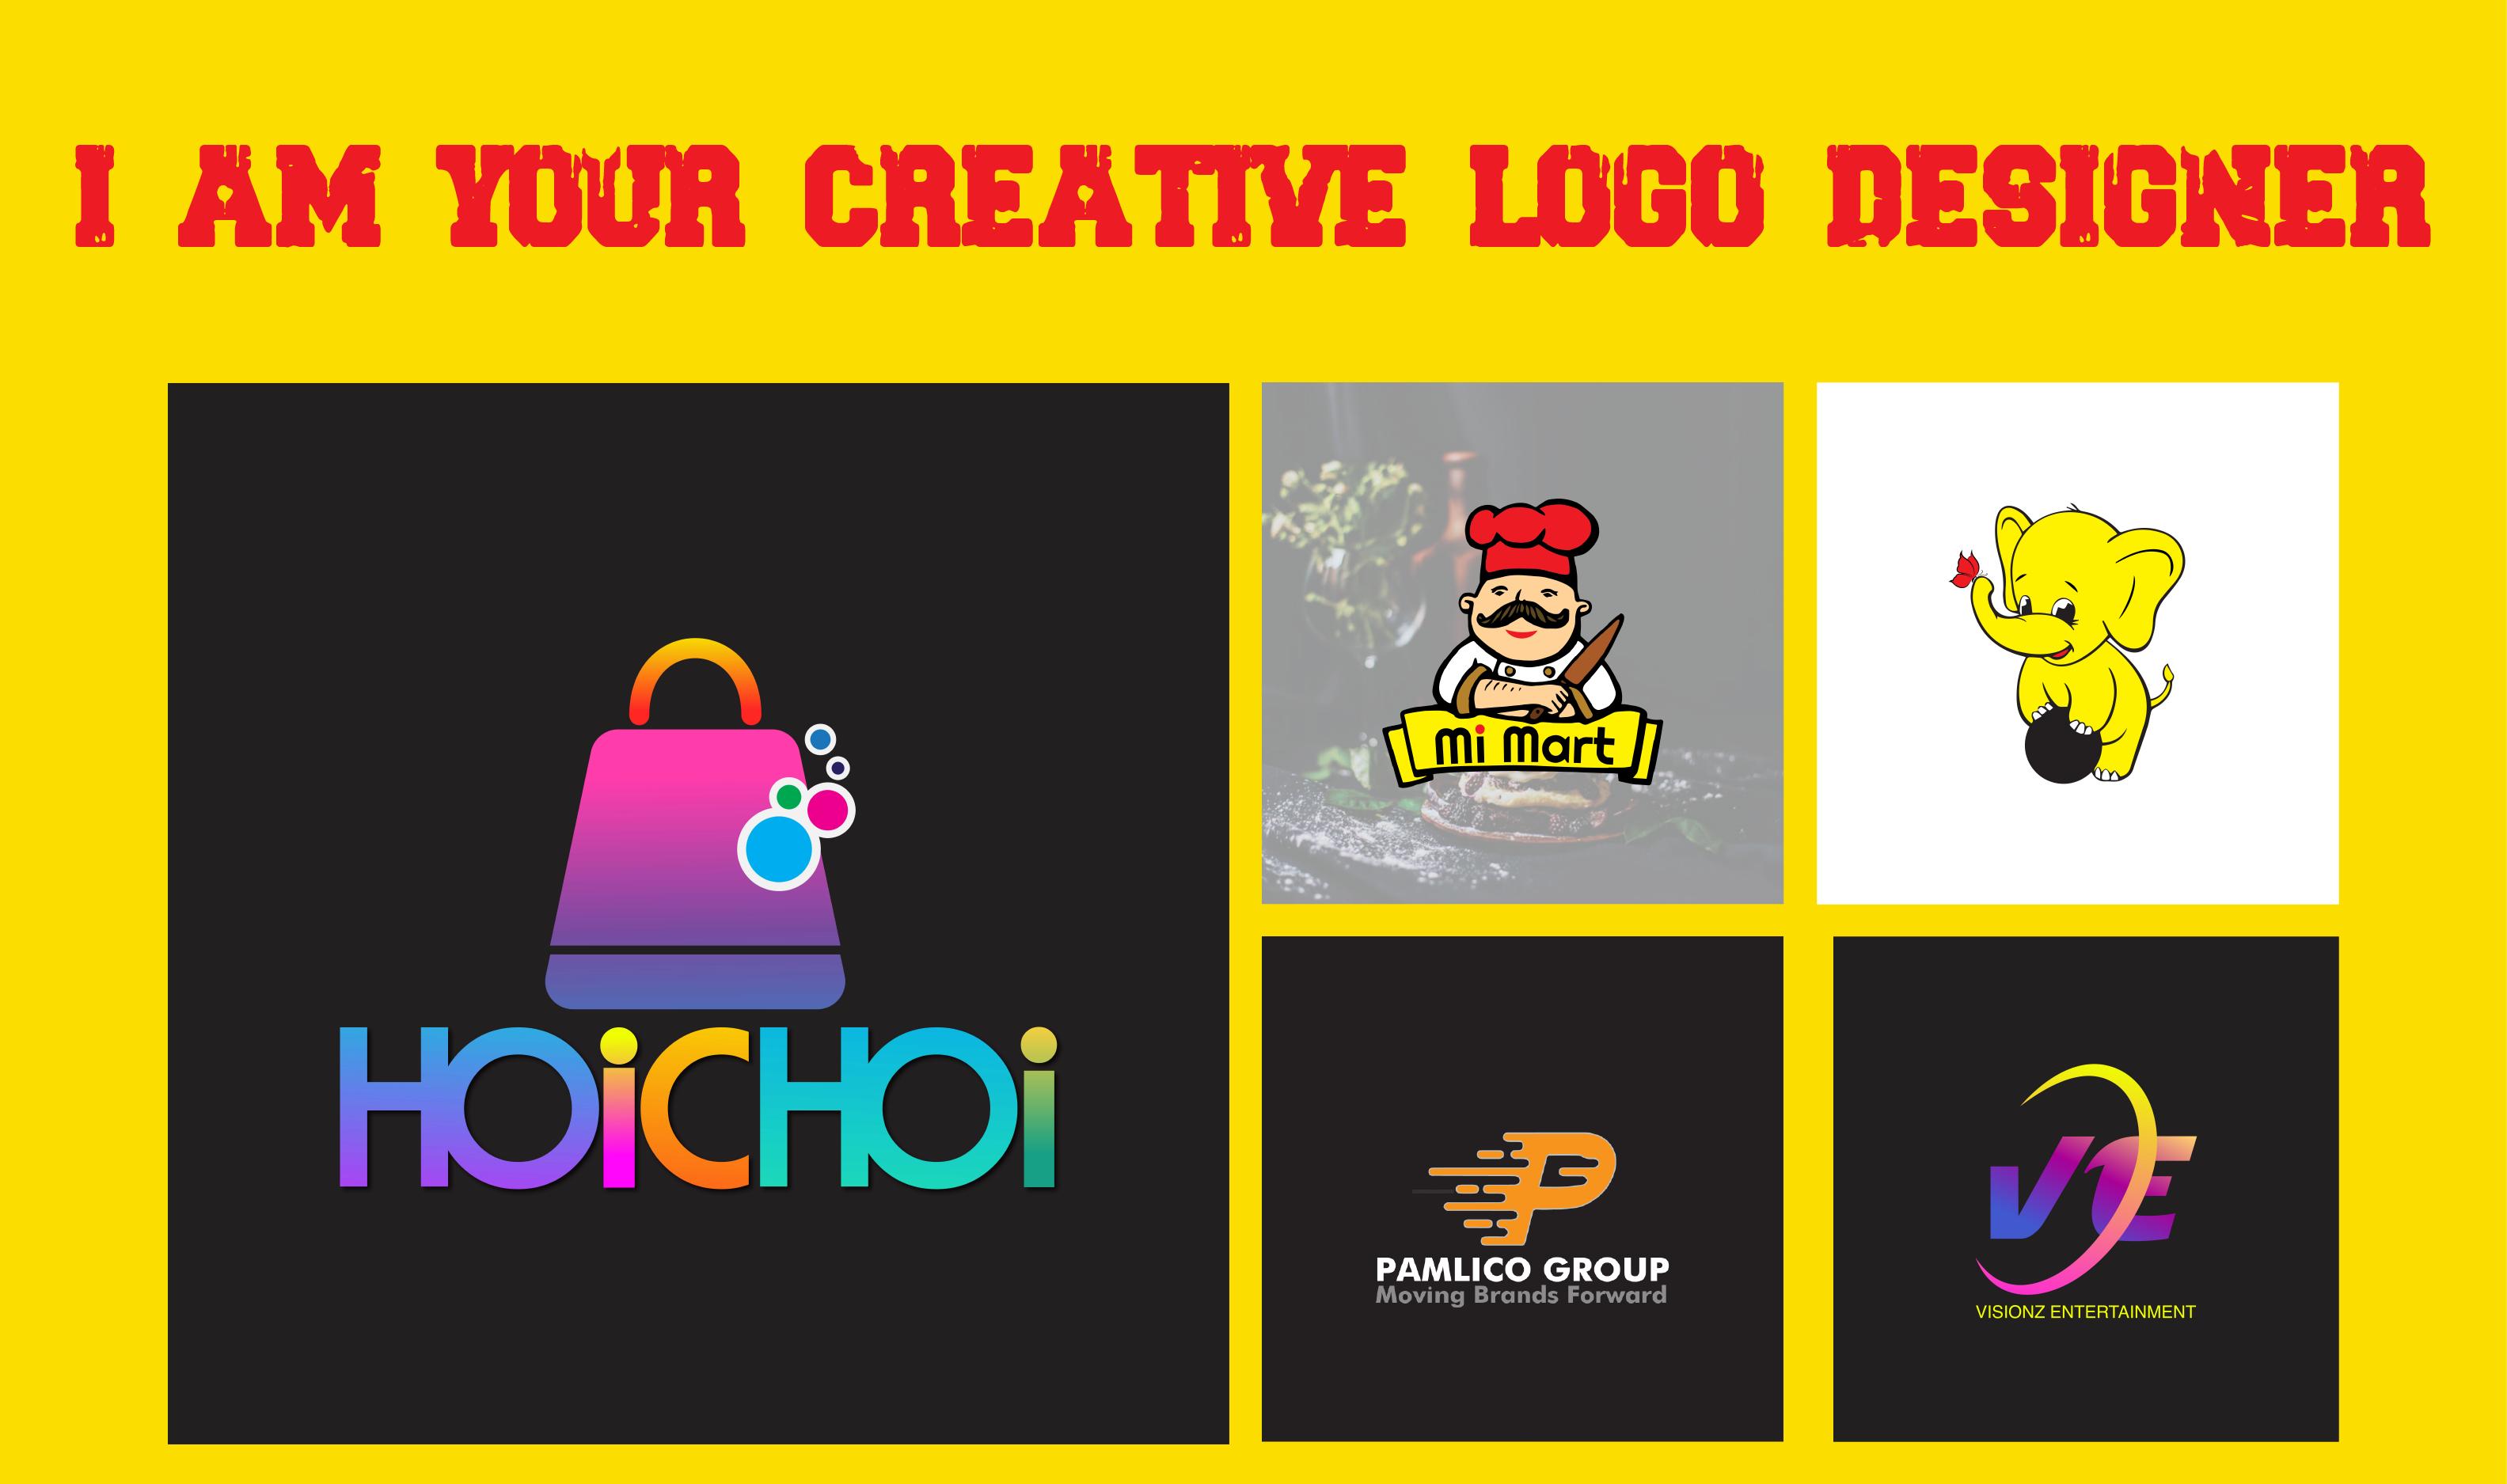 Shall we design a minimalist / modern / unique logo